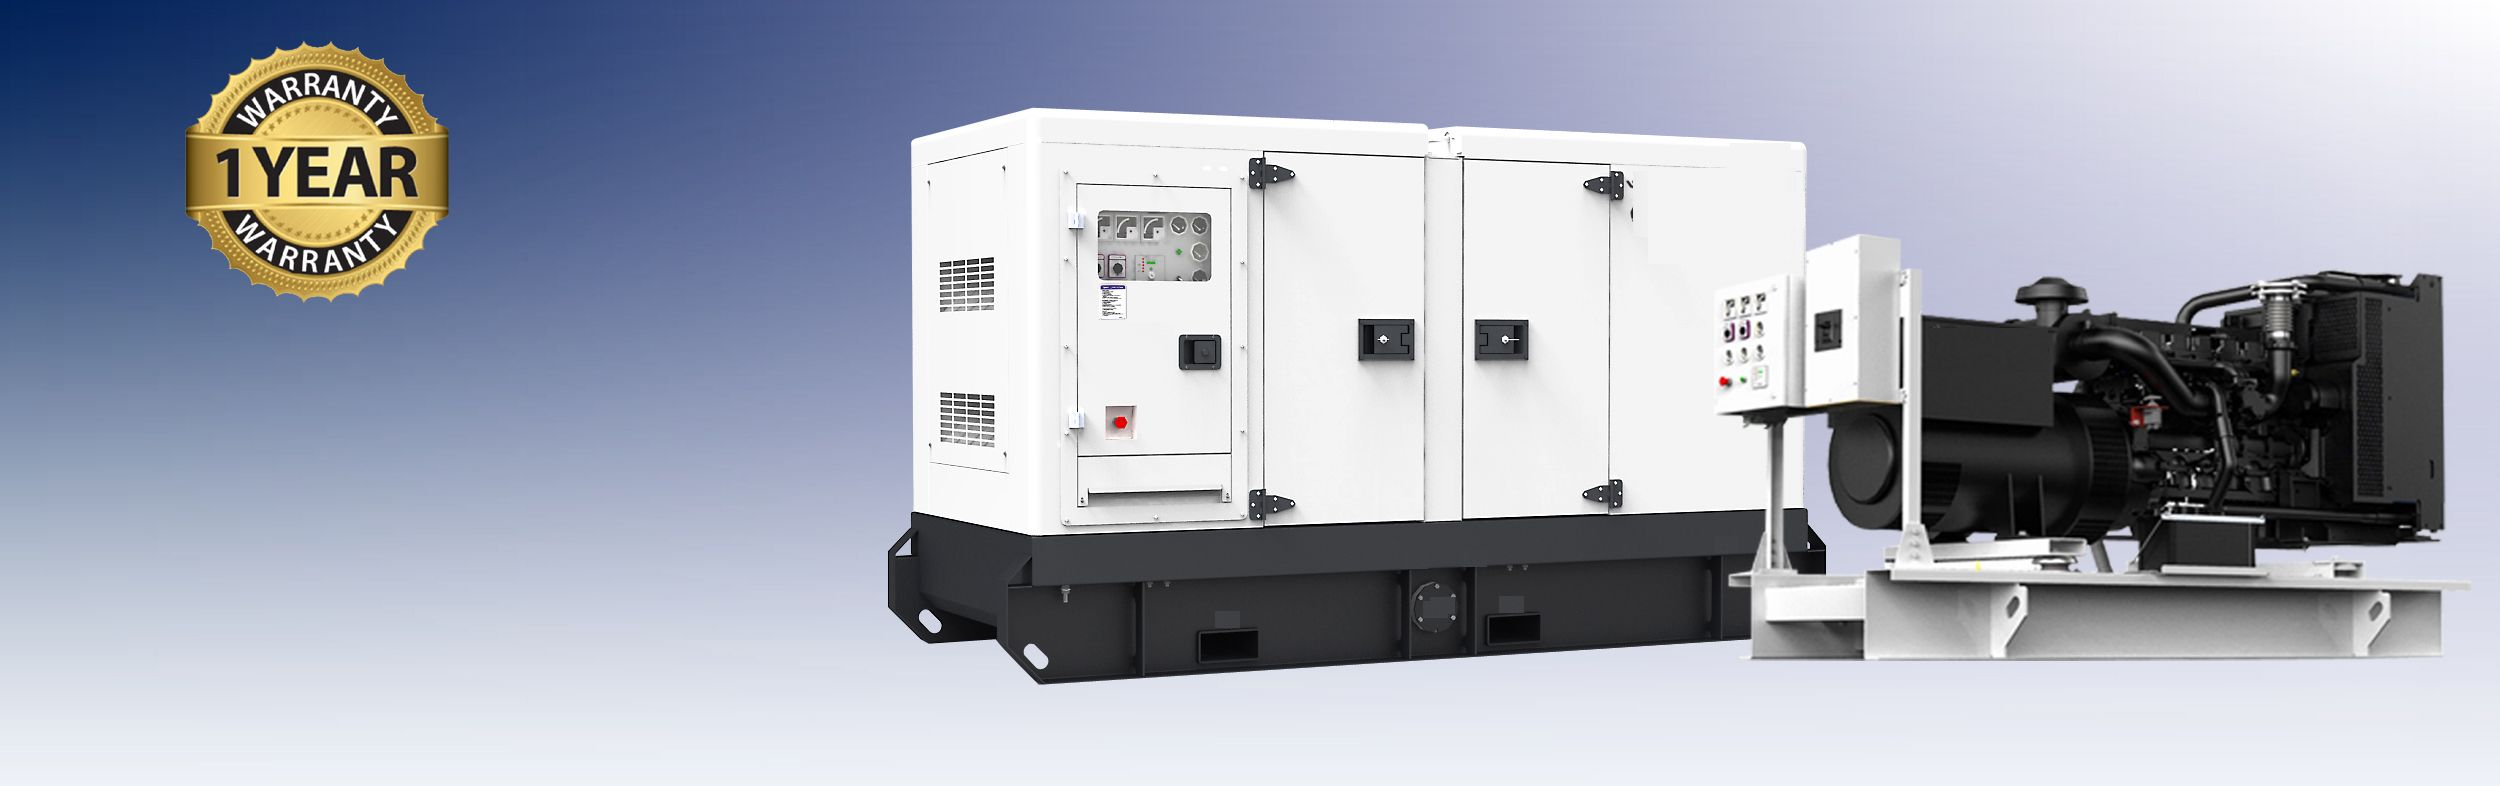 Ricardo 12 5kva 10kw Generator Generator Price Diesel Generators Alternator